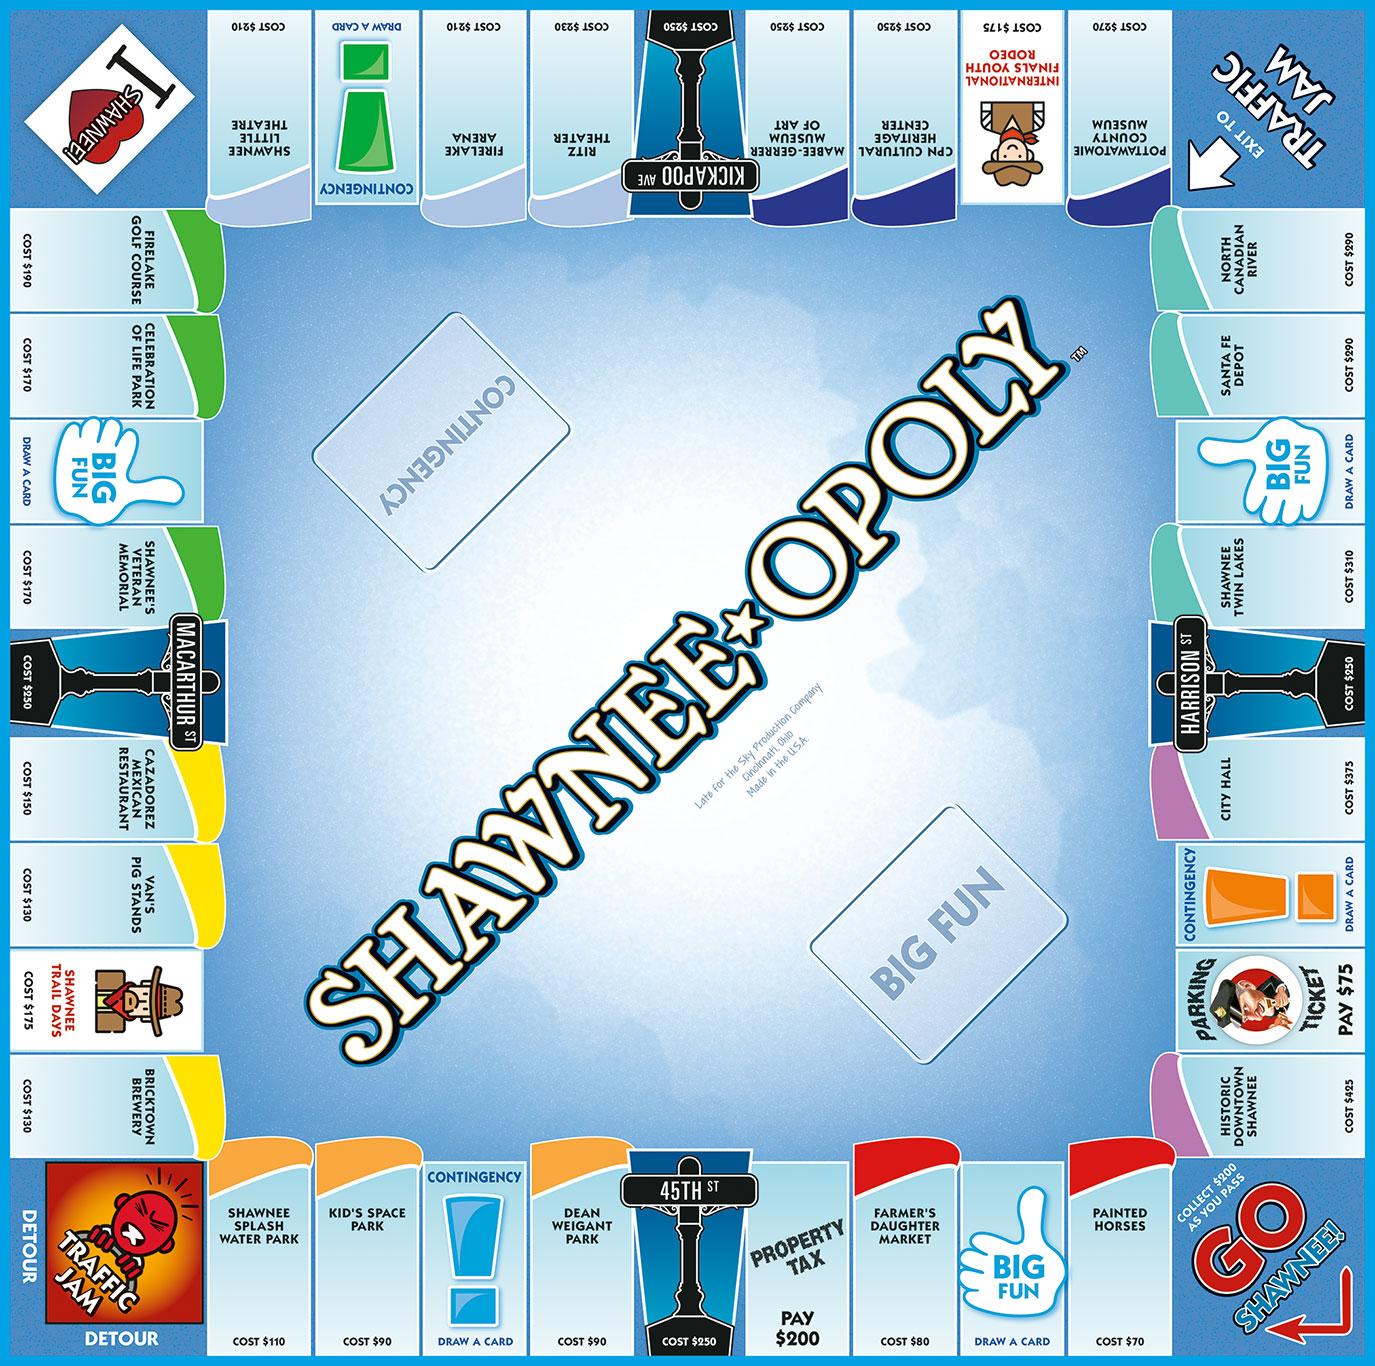 SHAWNEE-OPOLY Board Game